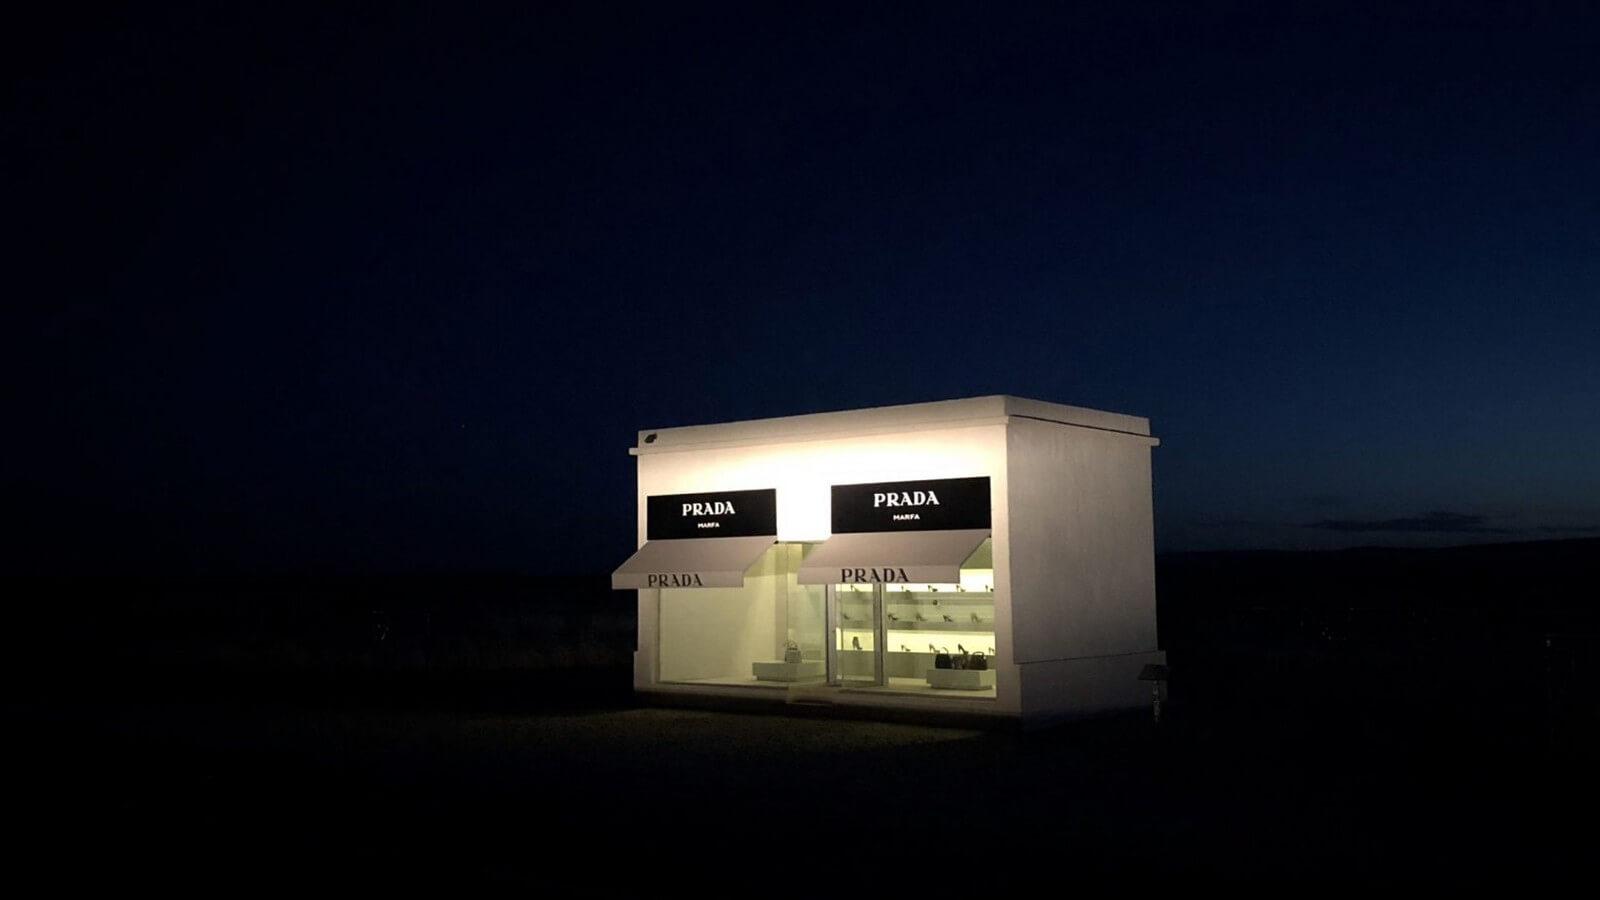 prada luxury brand marketing for a digital advertising